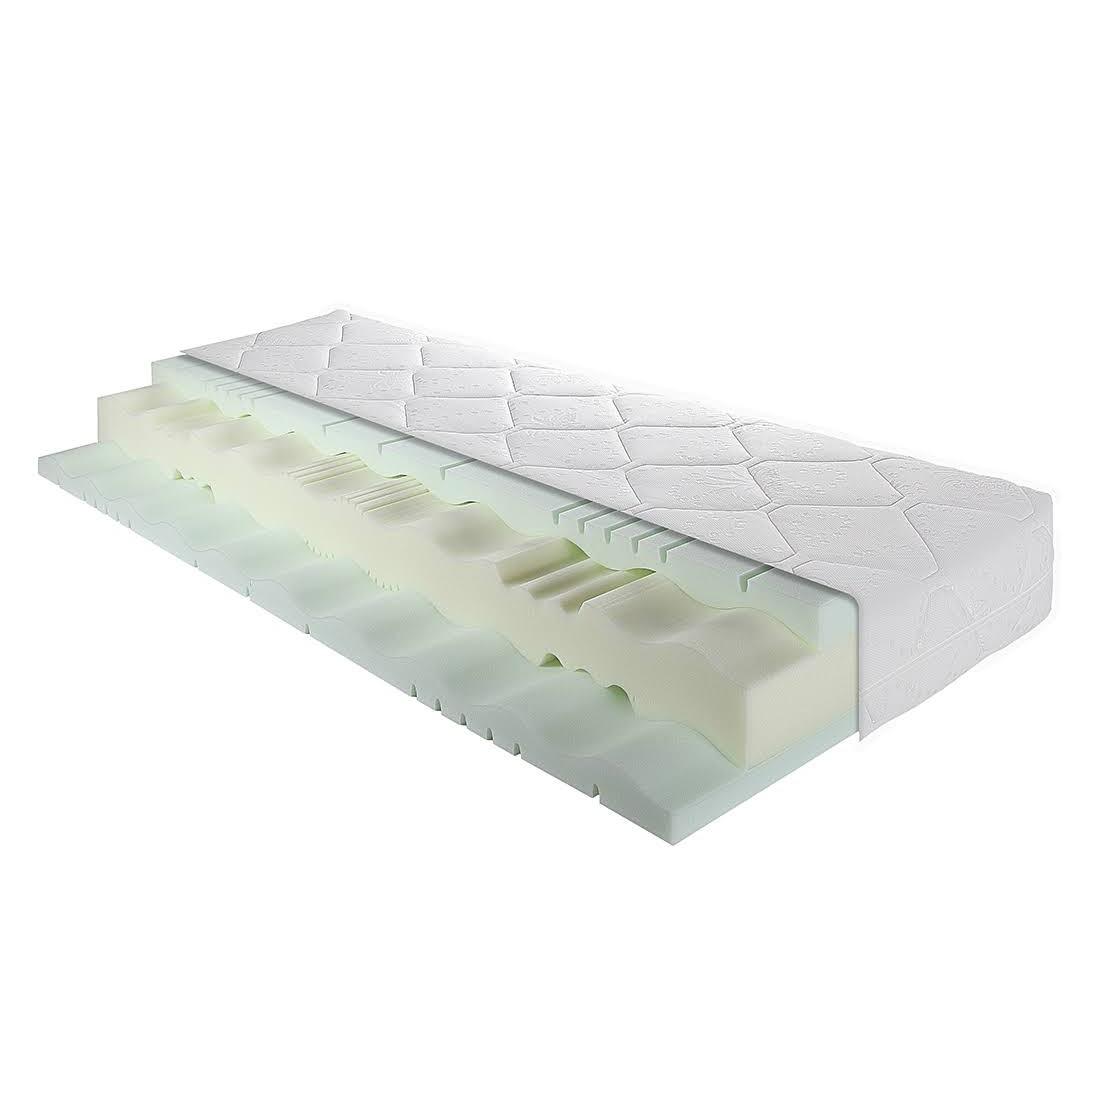 Materasso in schiuma a freddo 7 zone di comfort Highline - 140 x 200cm - H2 fino a 80 kg, Breckle